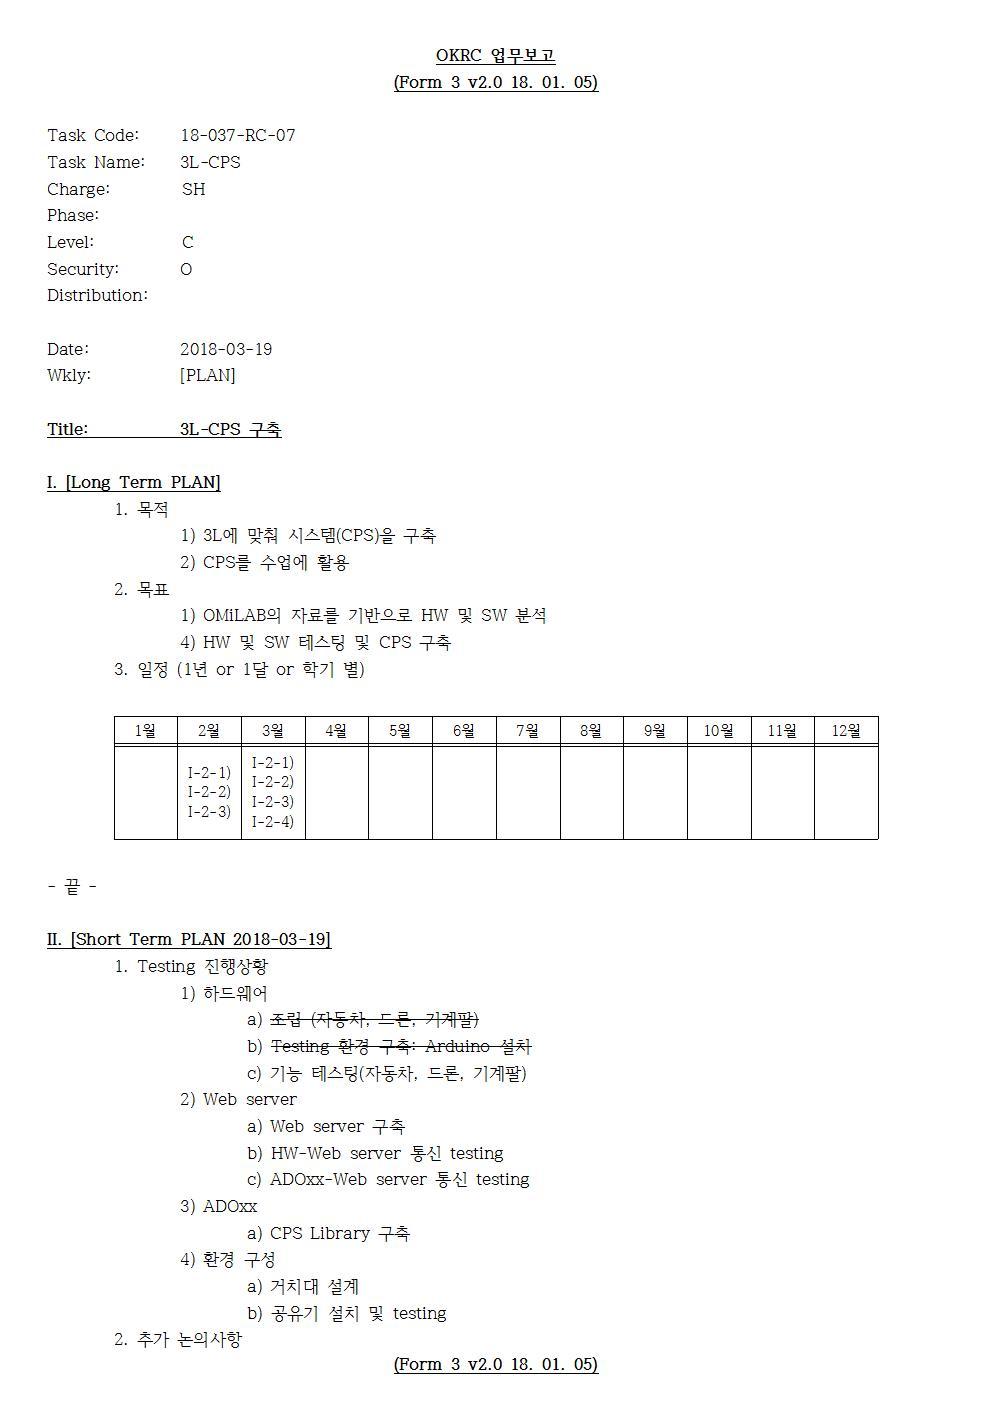 D-[18-037-RC-07]-[3L-CPS]-[2018-03-19][SH]001.jpg